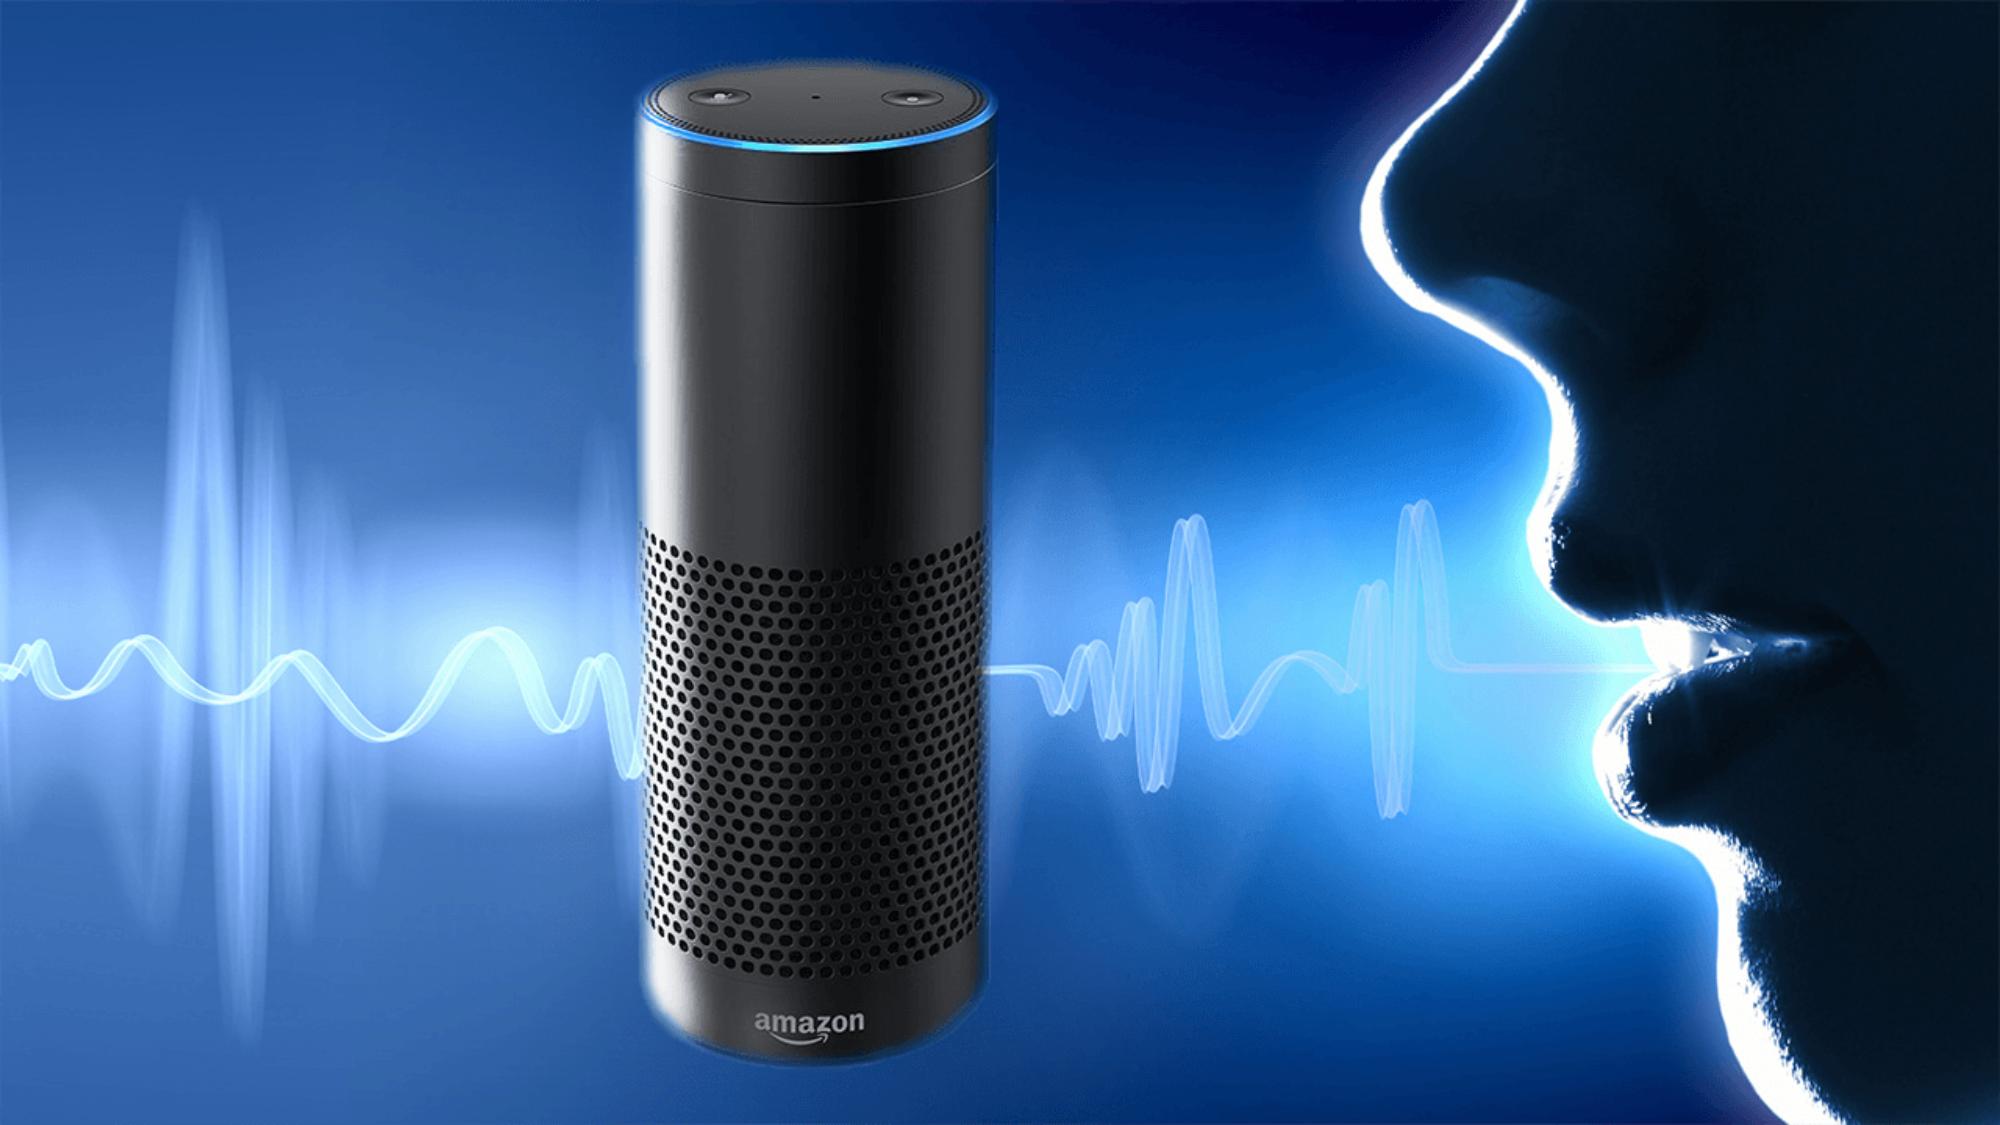 How to Send, Receive Messages on Amazon Echo Alexa app